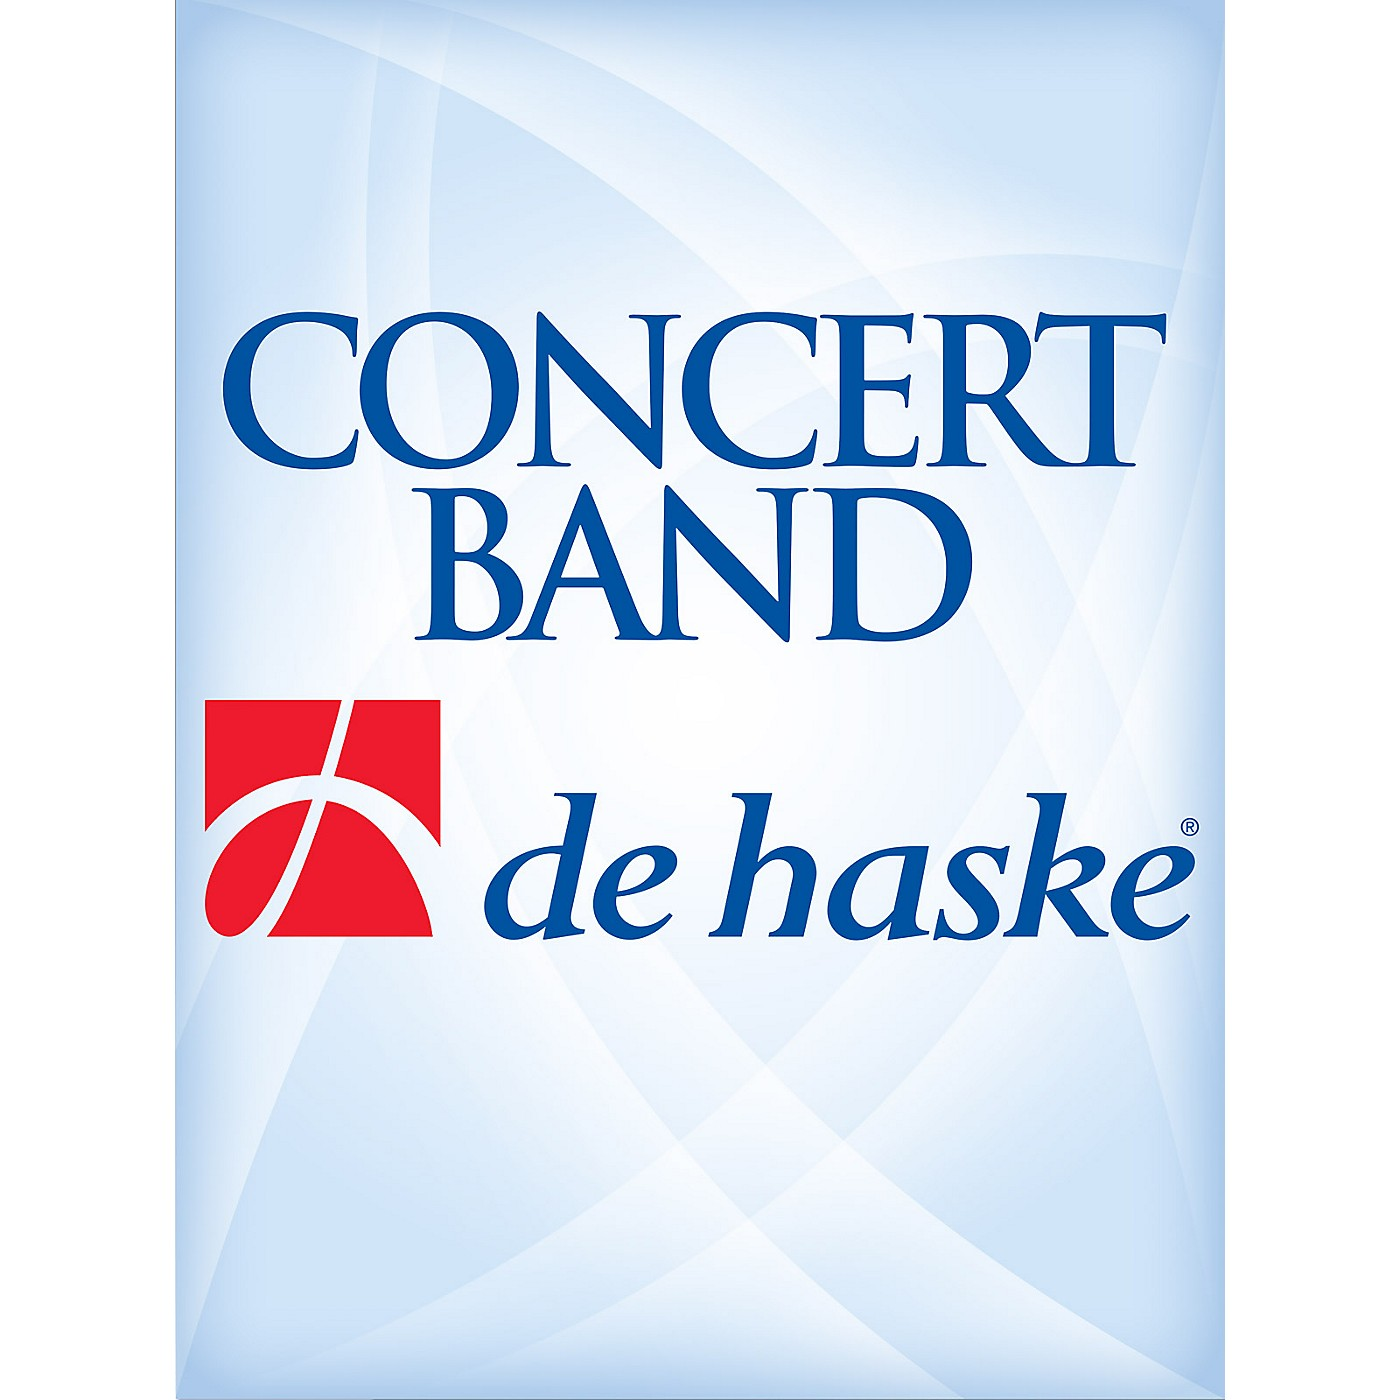 Hal Leonard Choral Music Full Score Concert Band thumbnail